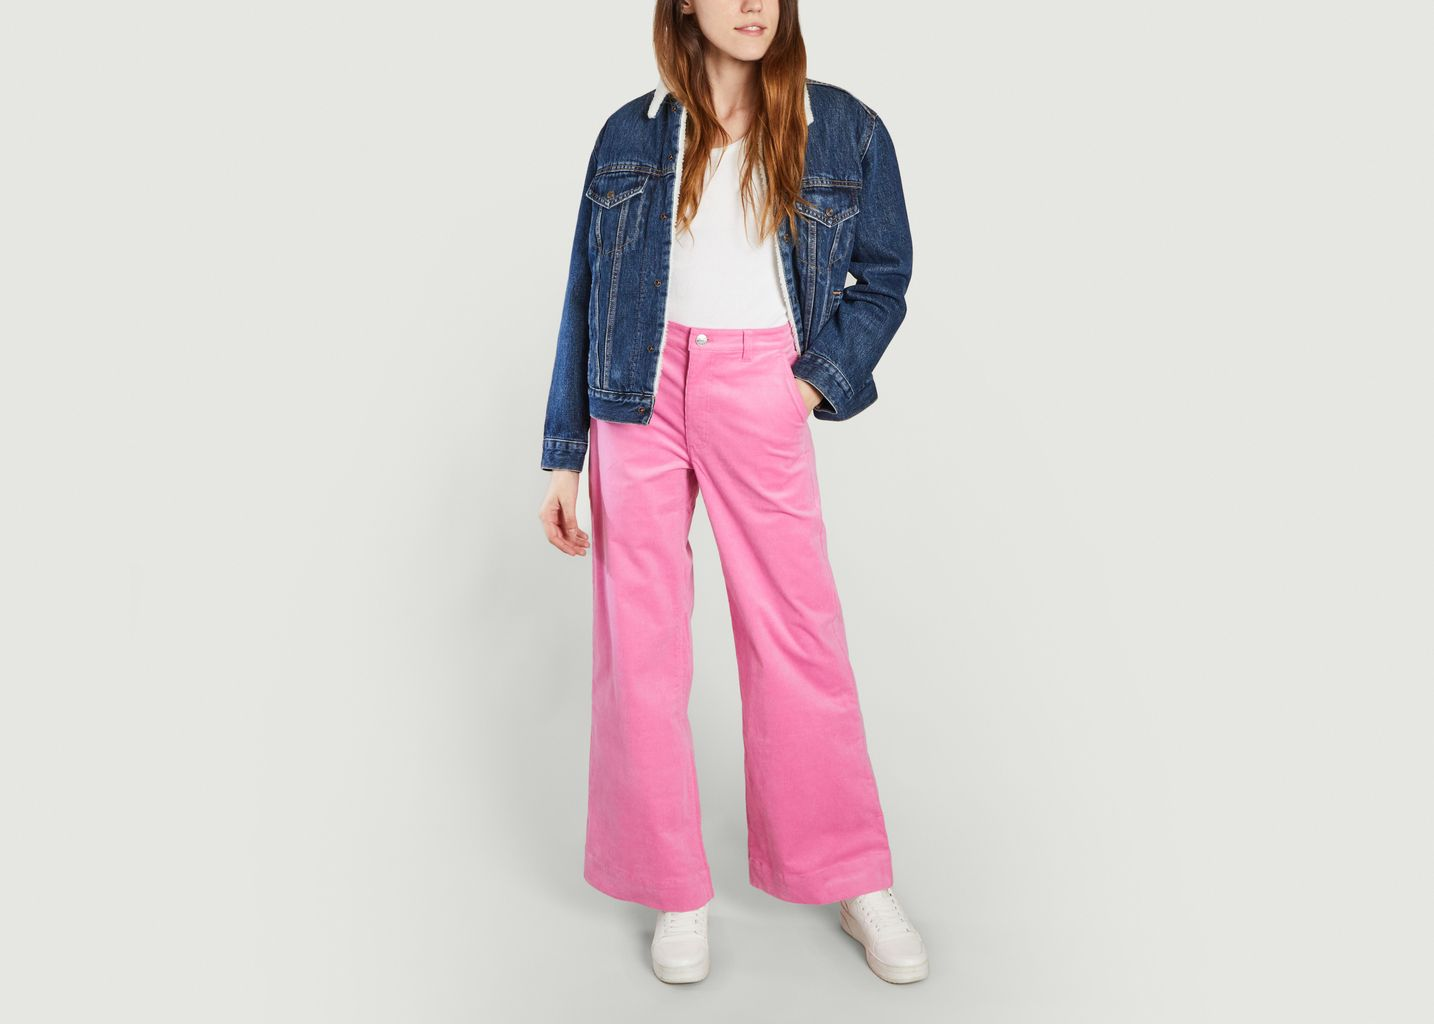 Pantalon Allie - Samsoe Samsoe